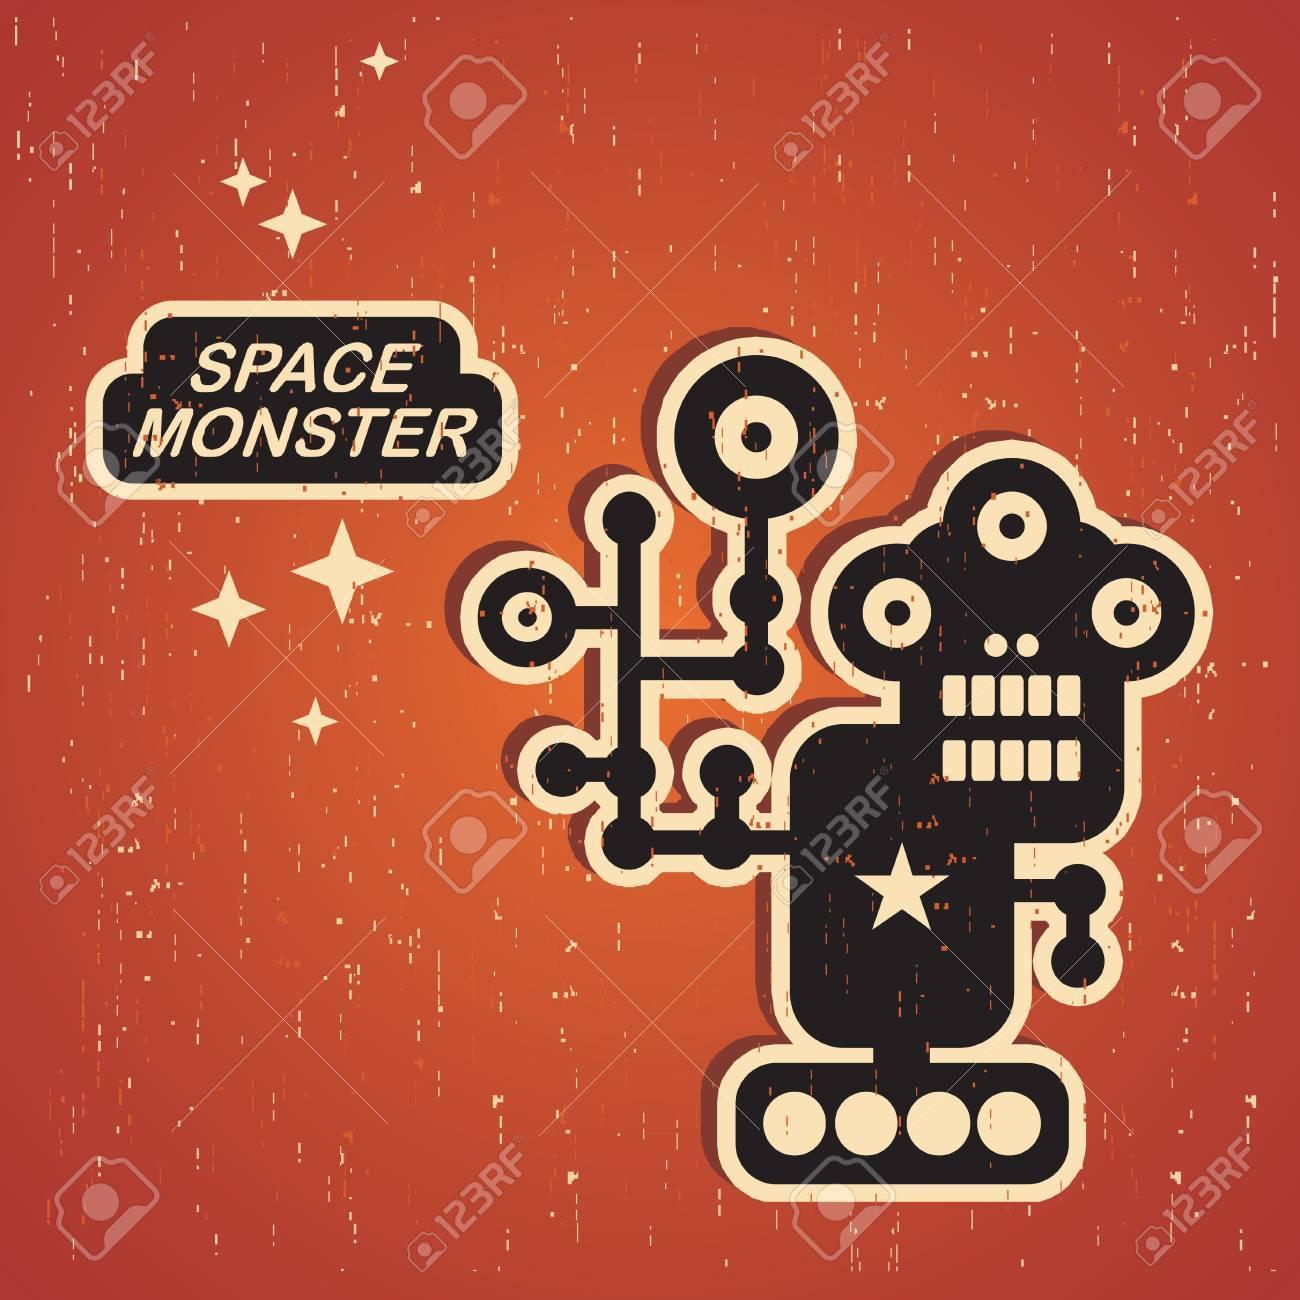 Retro monster. Vintage robot illustration in vector. Stock Vector - 15540818